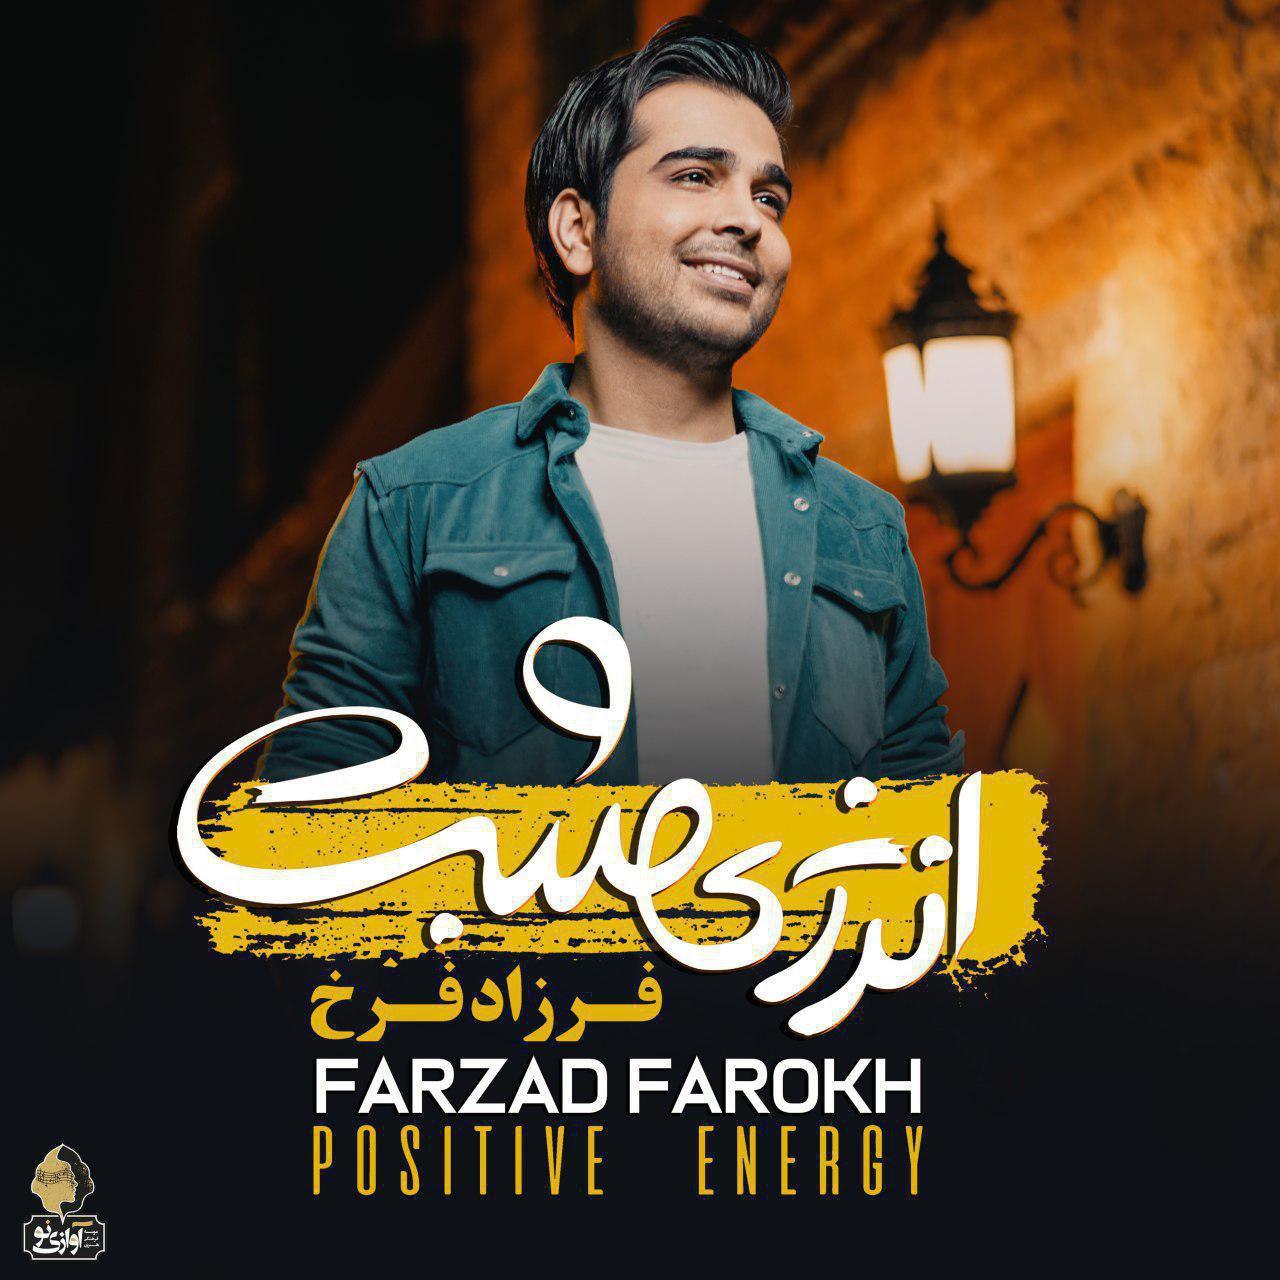 Farzad Farokh – Energy Mosbat